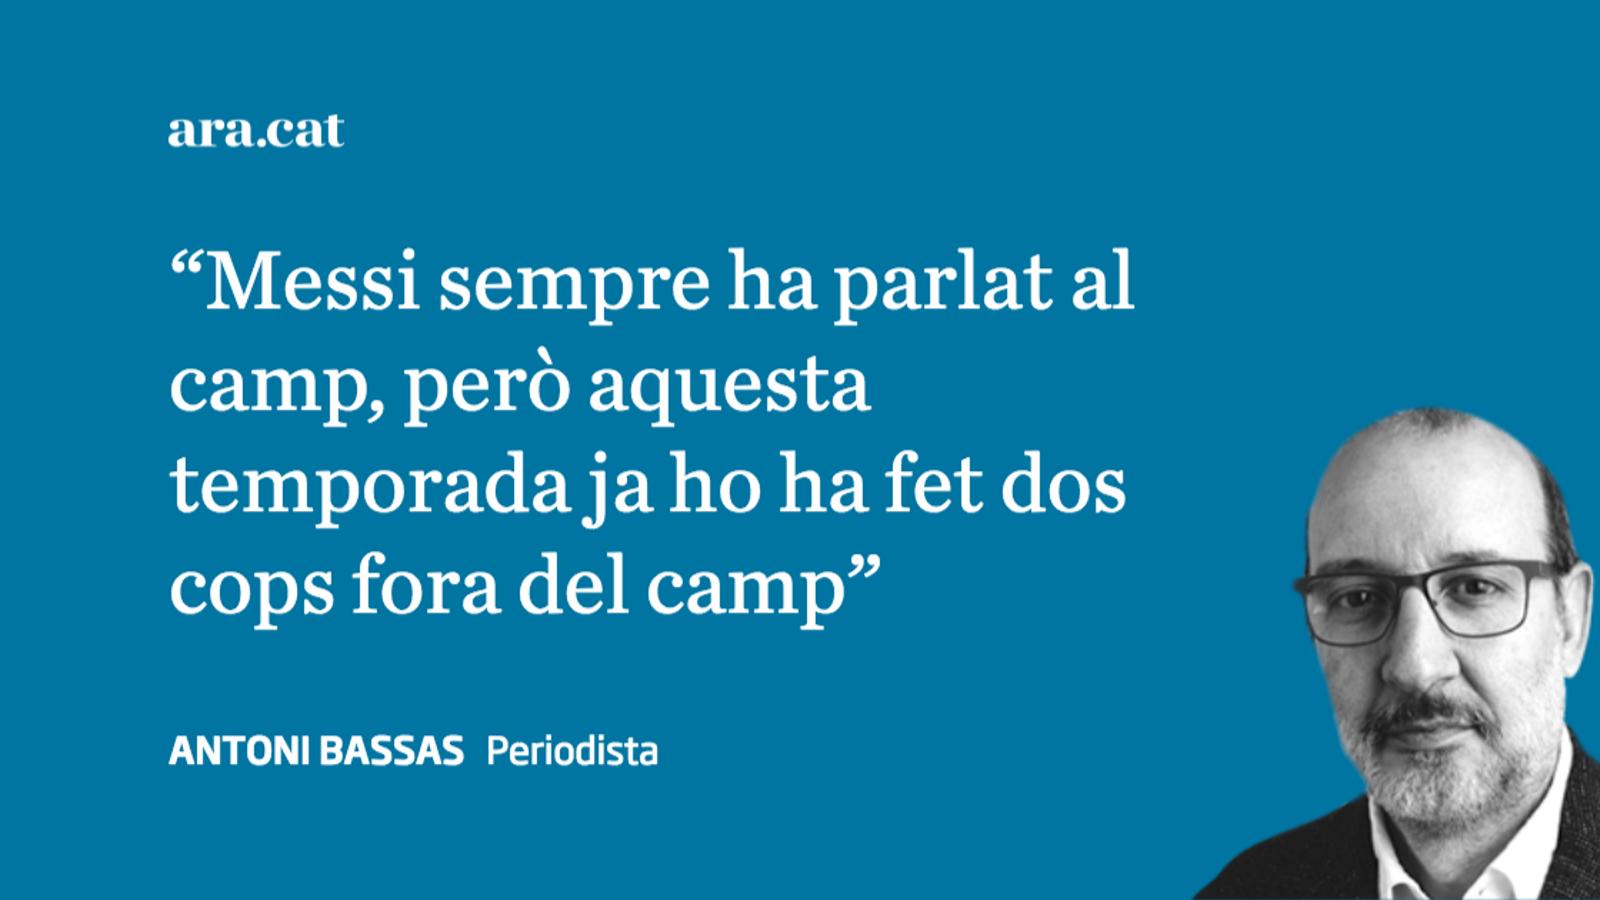 Paraula de Messi i aturada de Cillessen